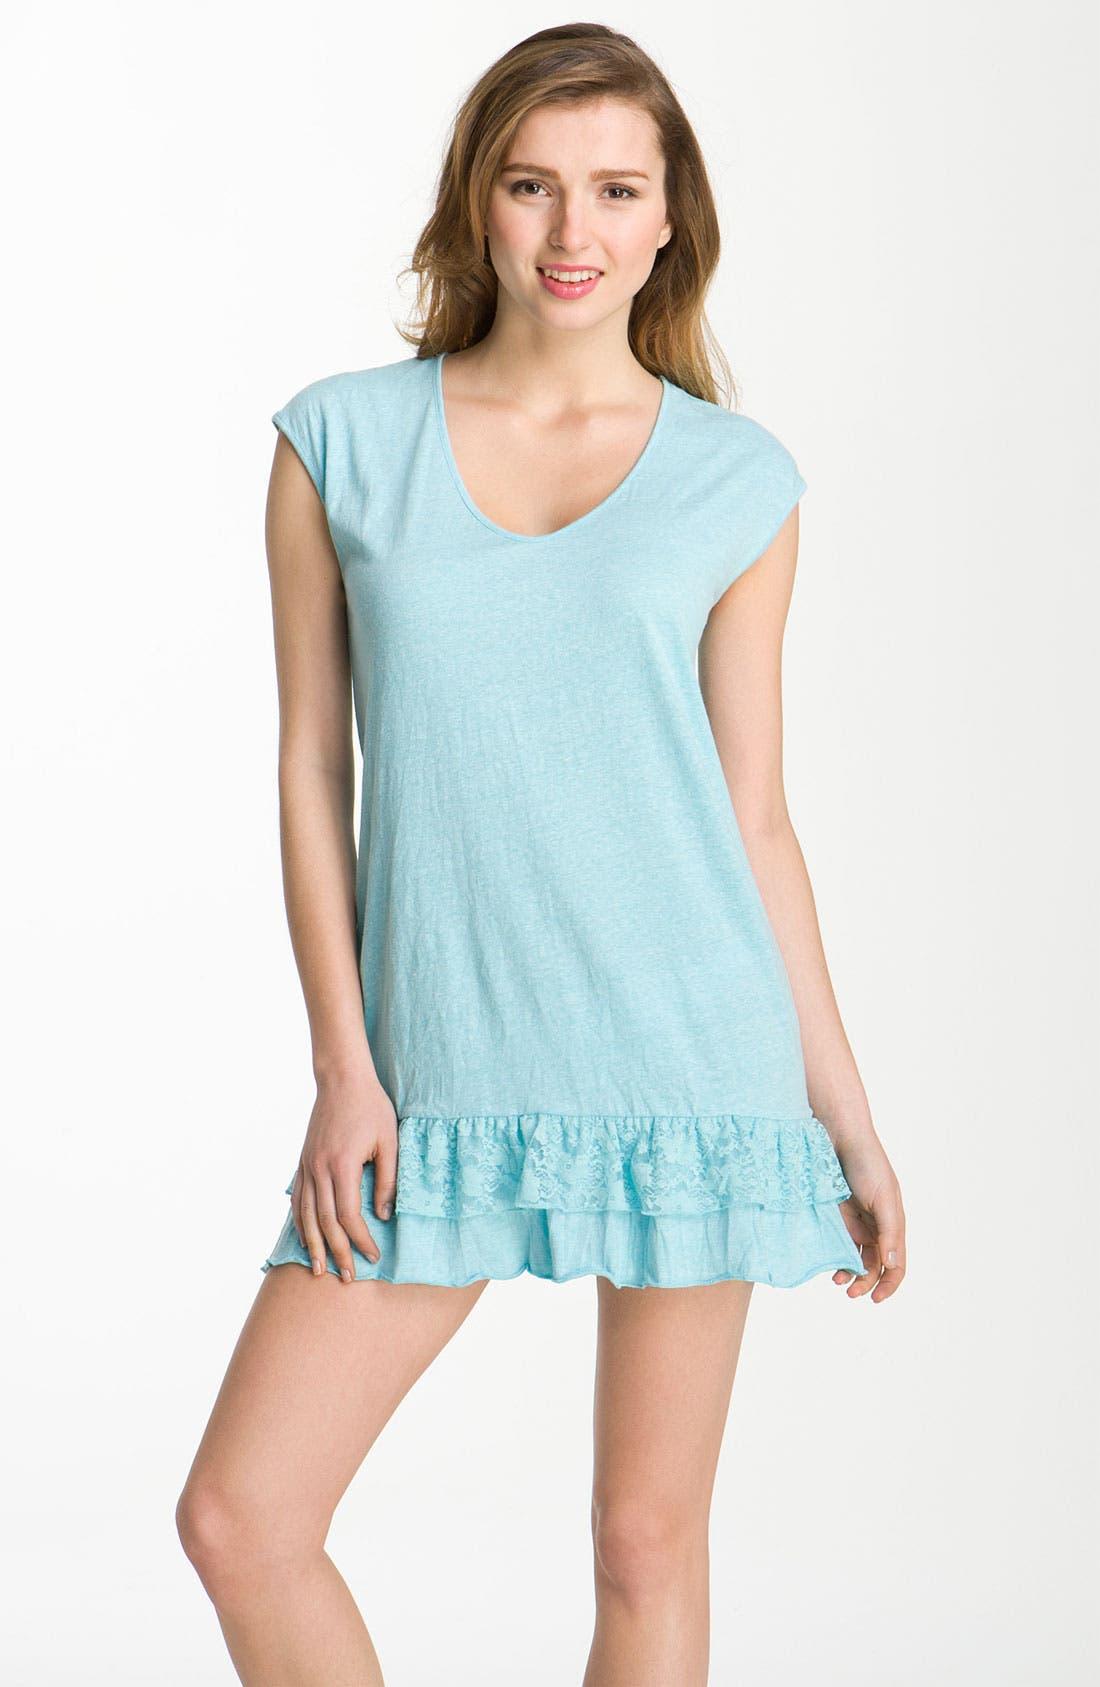 Alternate Image 1 Selected - Make + Model 'Frou Frou' Sleep Shirt